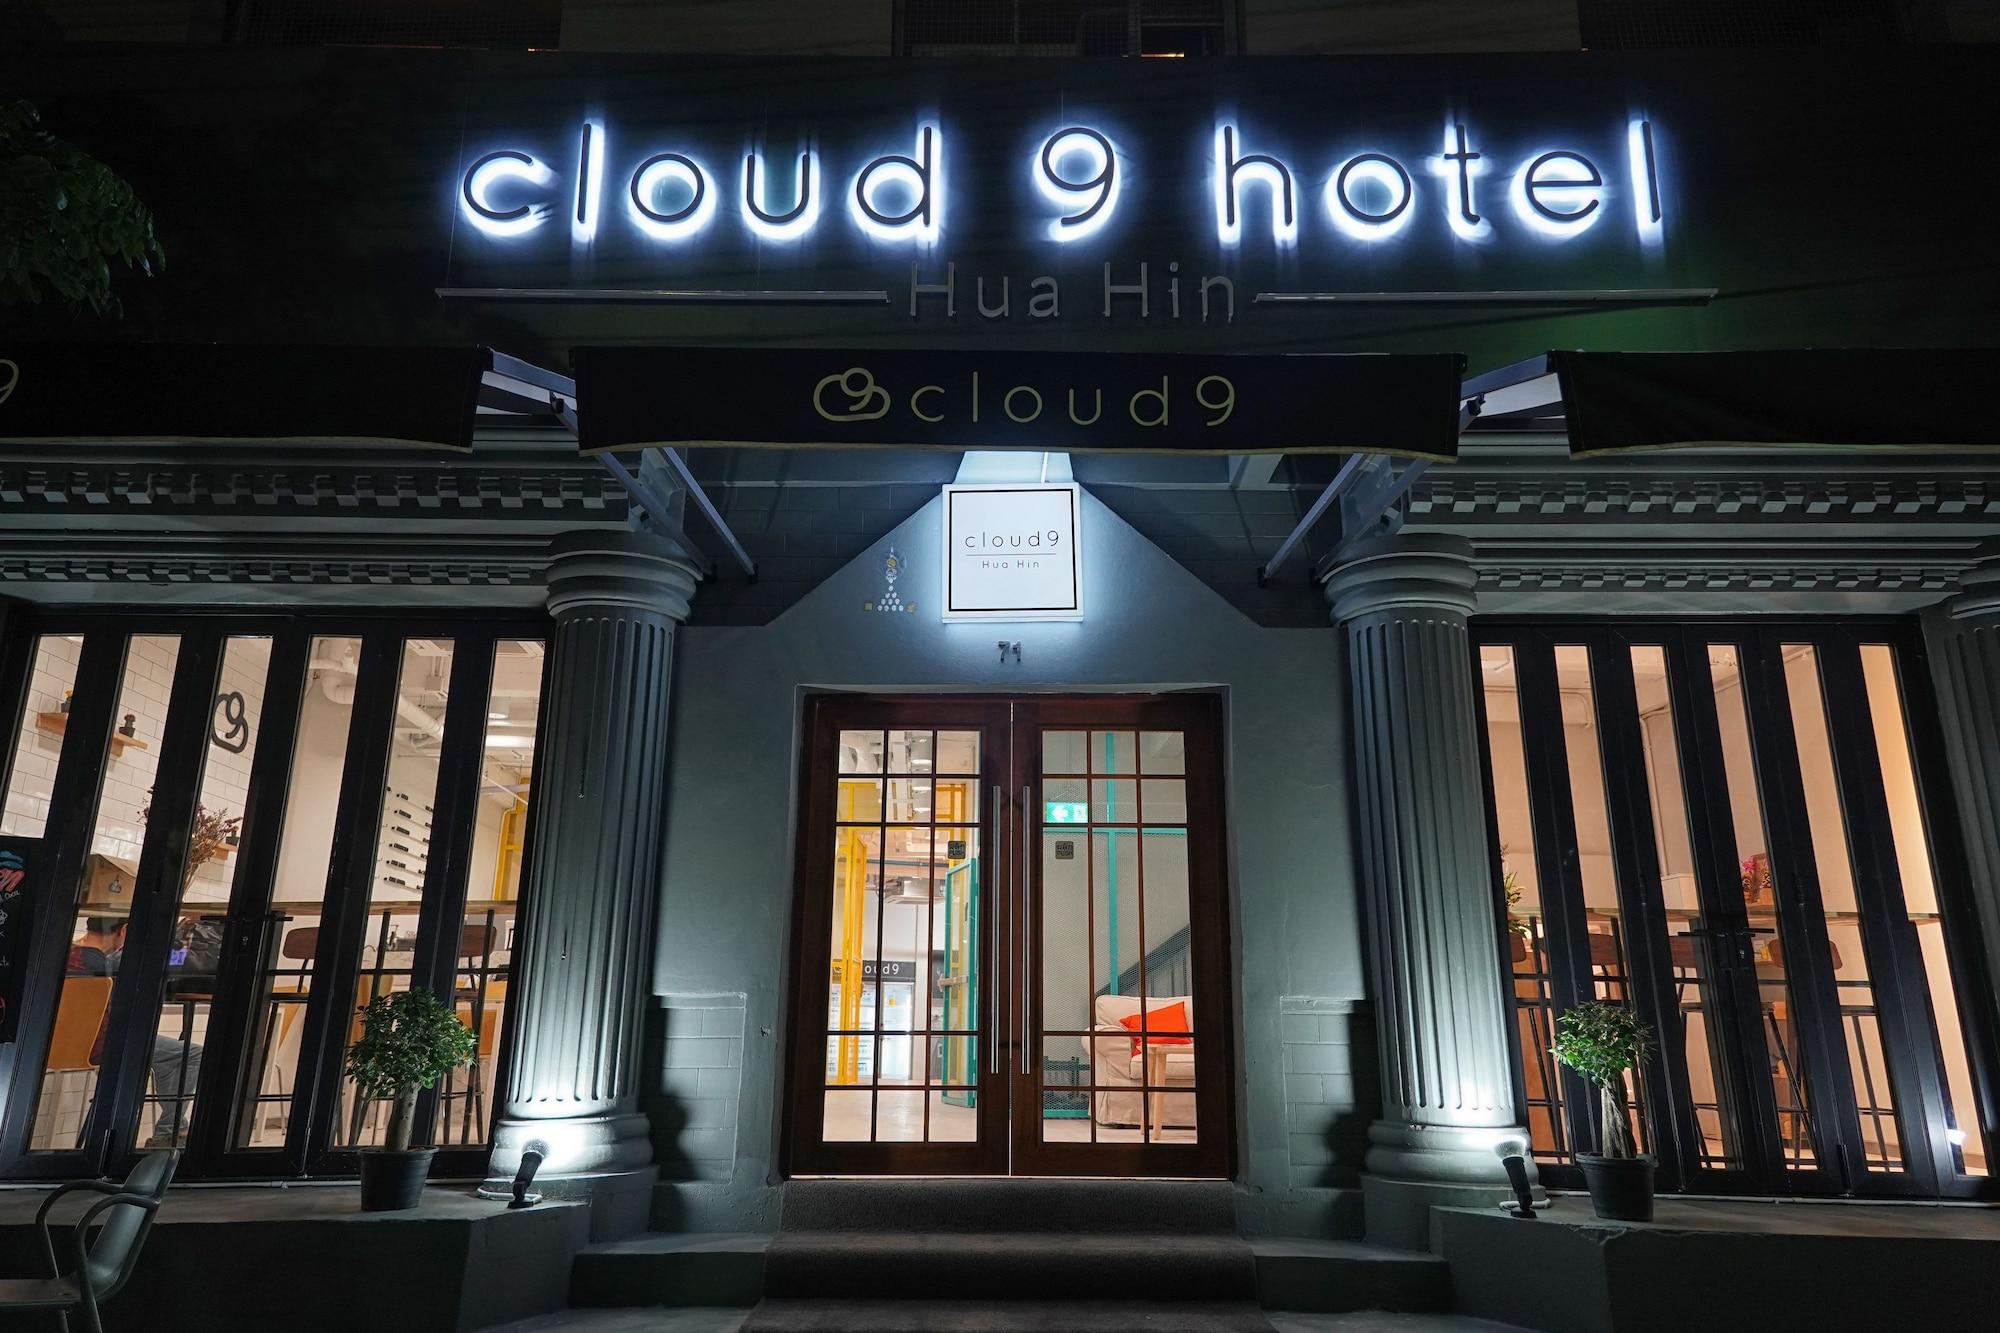 Cloud 9 Hotel Hua Hin - Hostel, Hua Hin